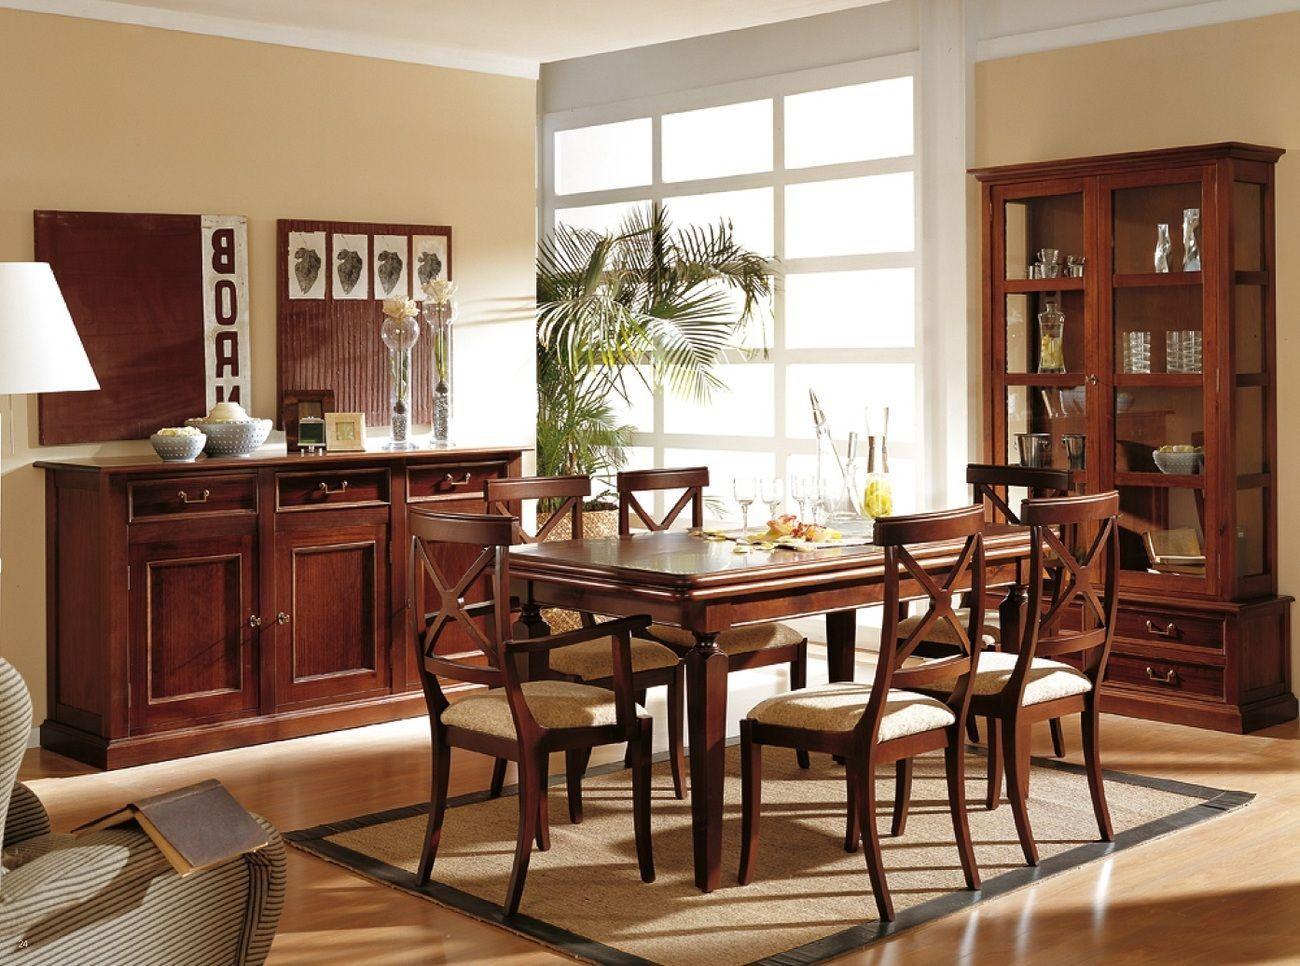 Comedor clásico Solano | Έπιπλα-Ιδέες για το σπίτι | Comedores ...